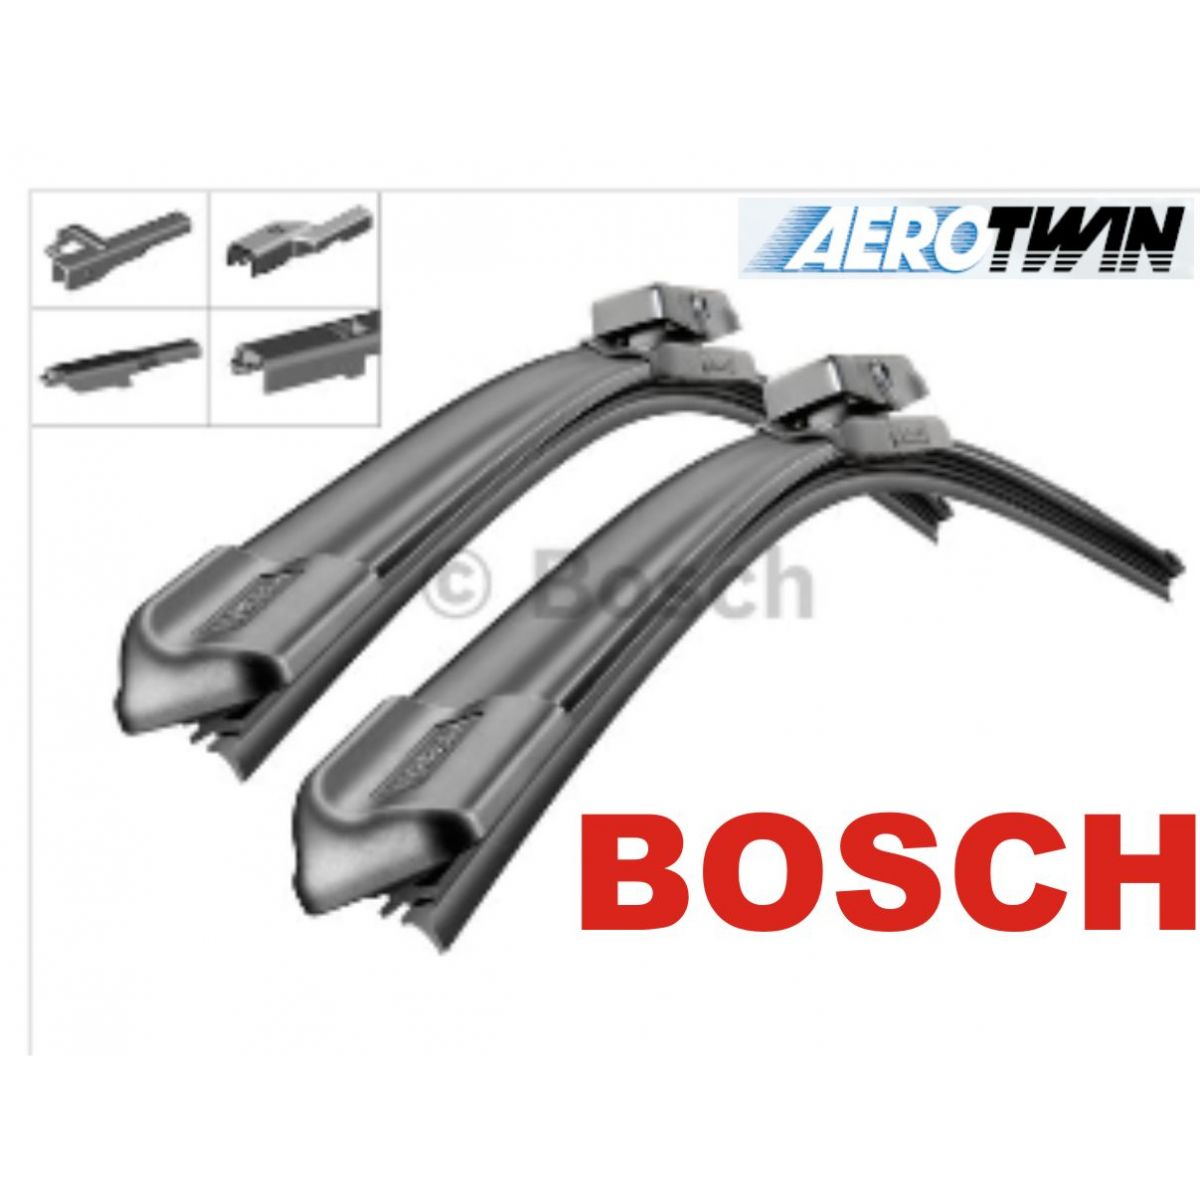 Palheta Bosch Aerotwin Plus Limpador de para brisa Bosch HYUNDAI Equus Genesis